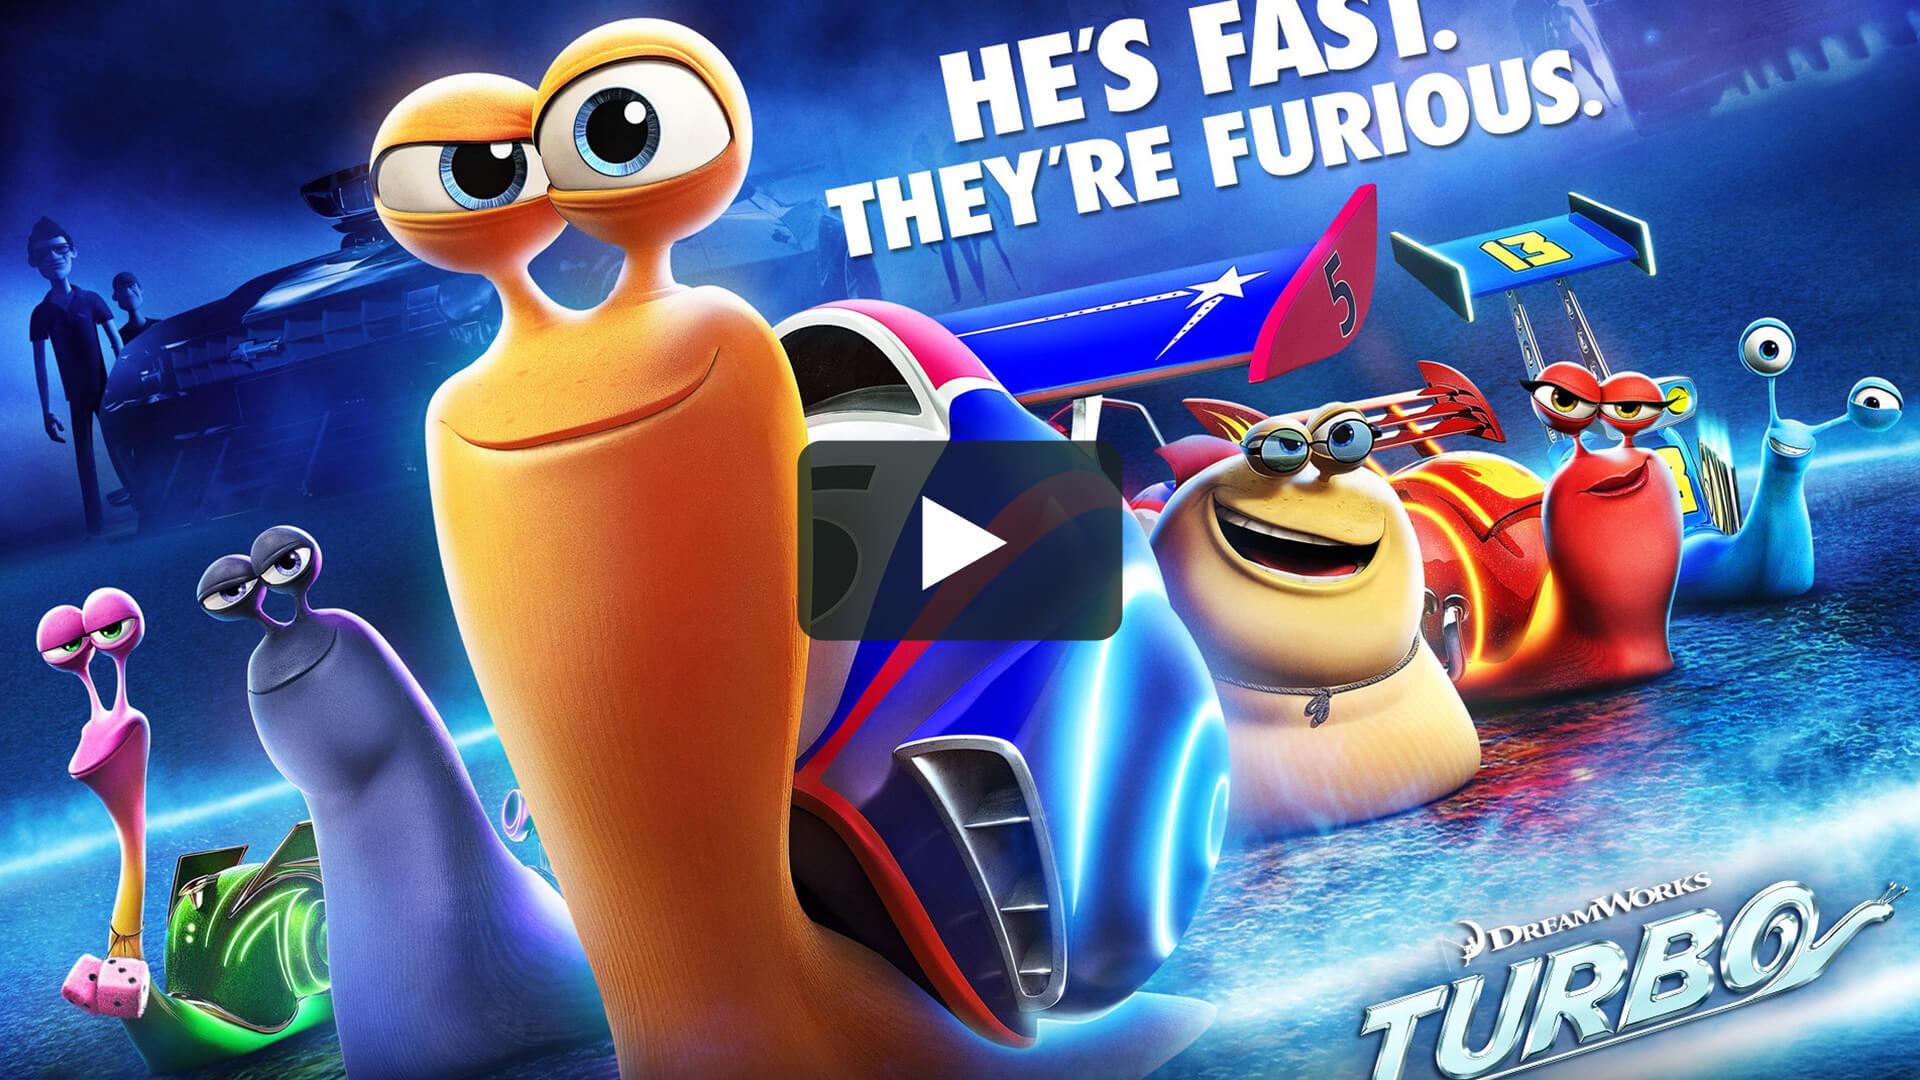 Turbo - 極速蝸牛